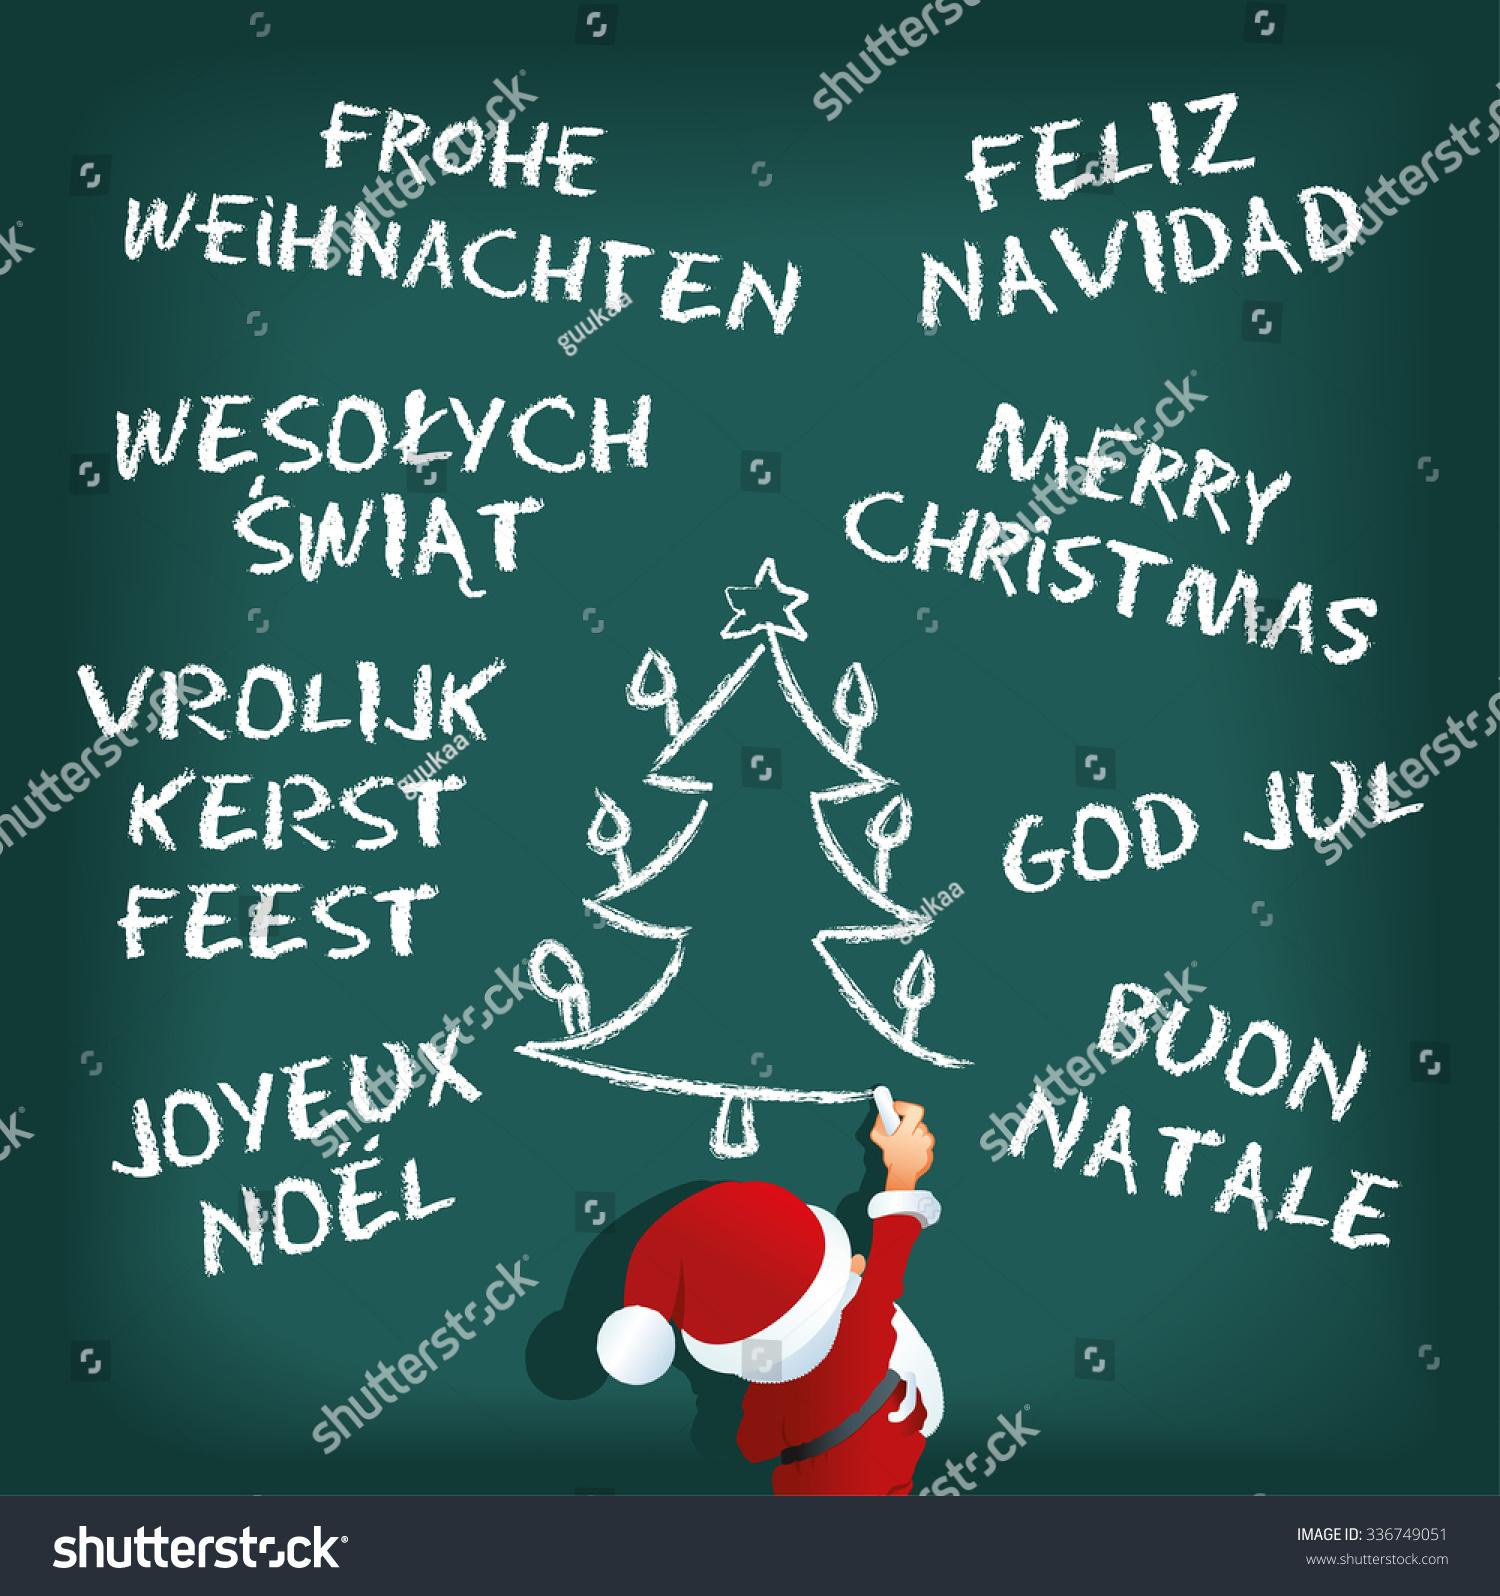 Merry Christmas Different Languages.Santa Claus In Different Languages Merry Christmas In